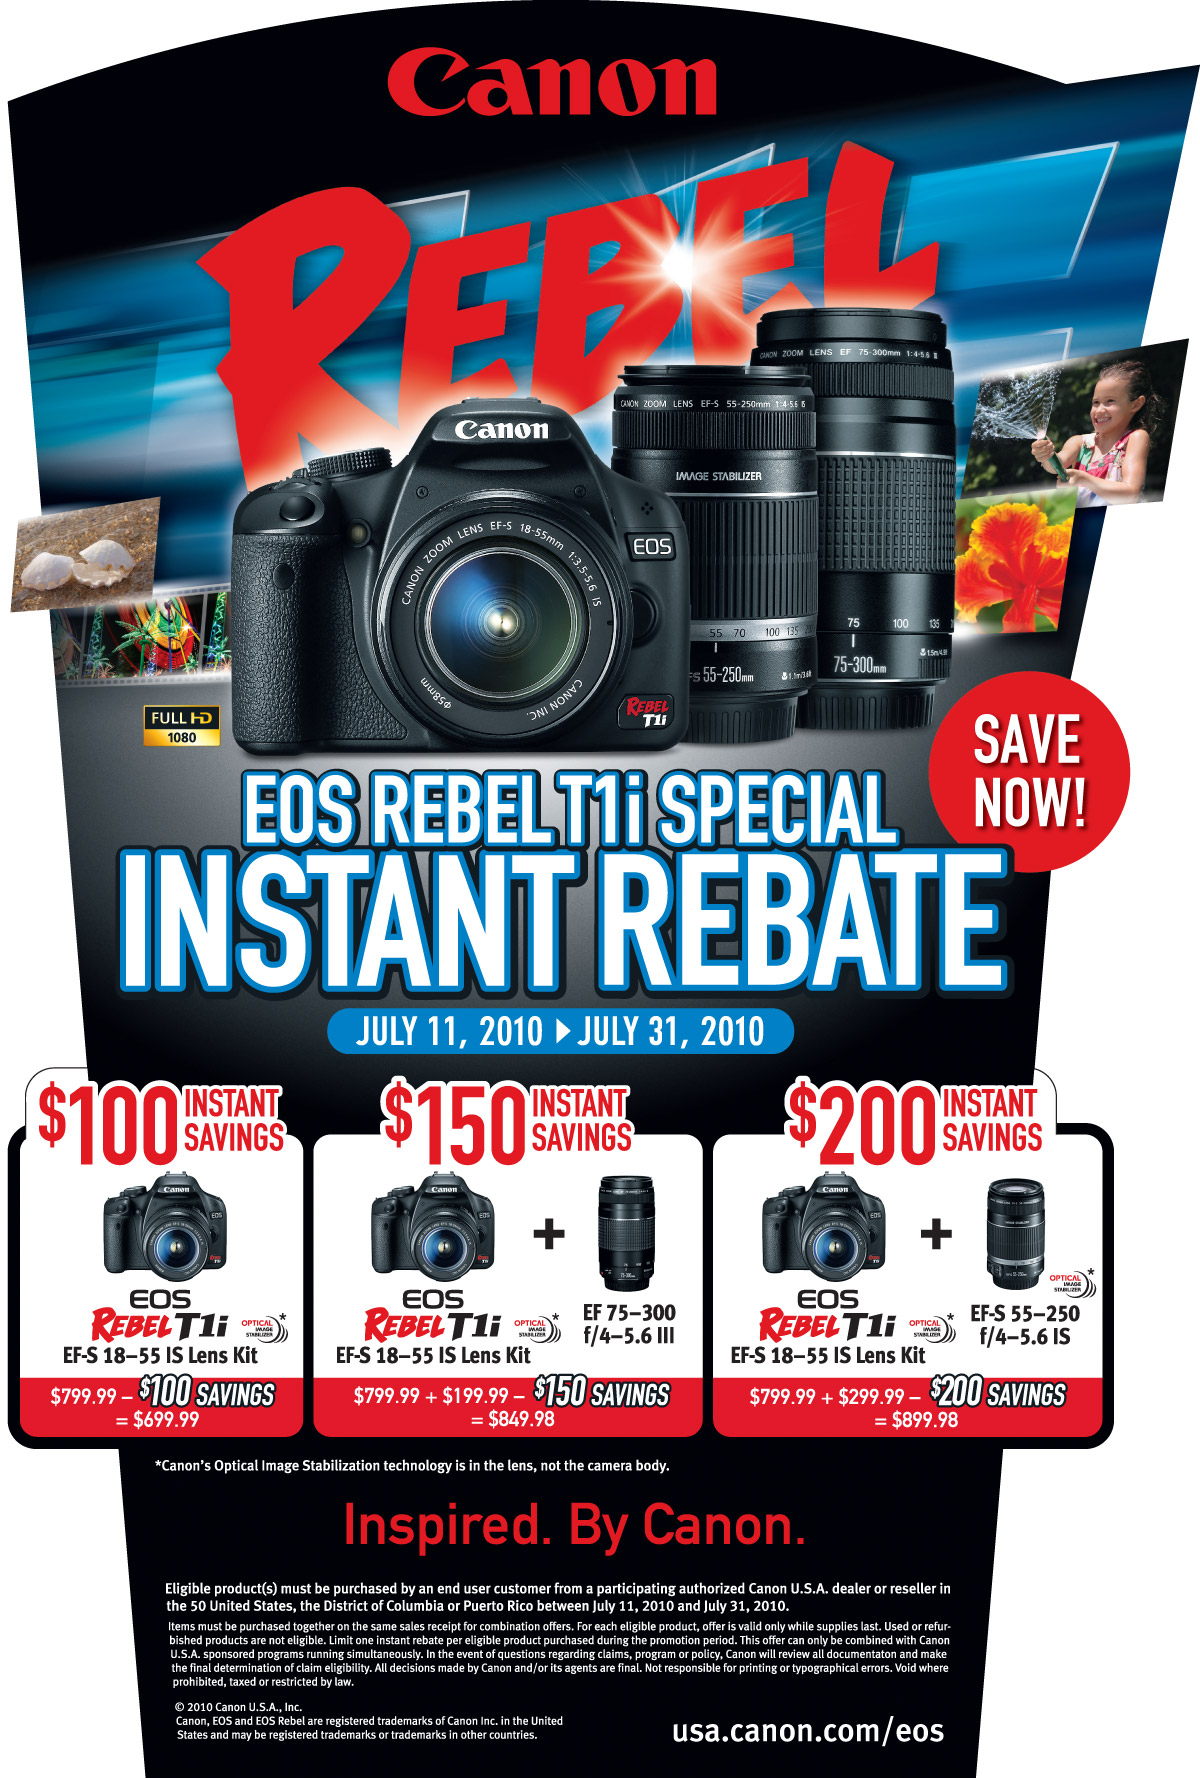 Canon, Nikon and Sony News for Jul 2010